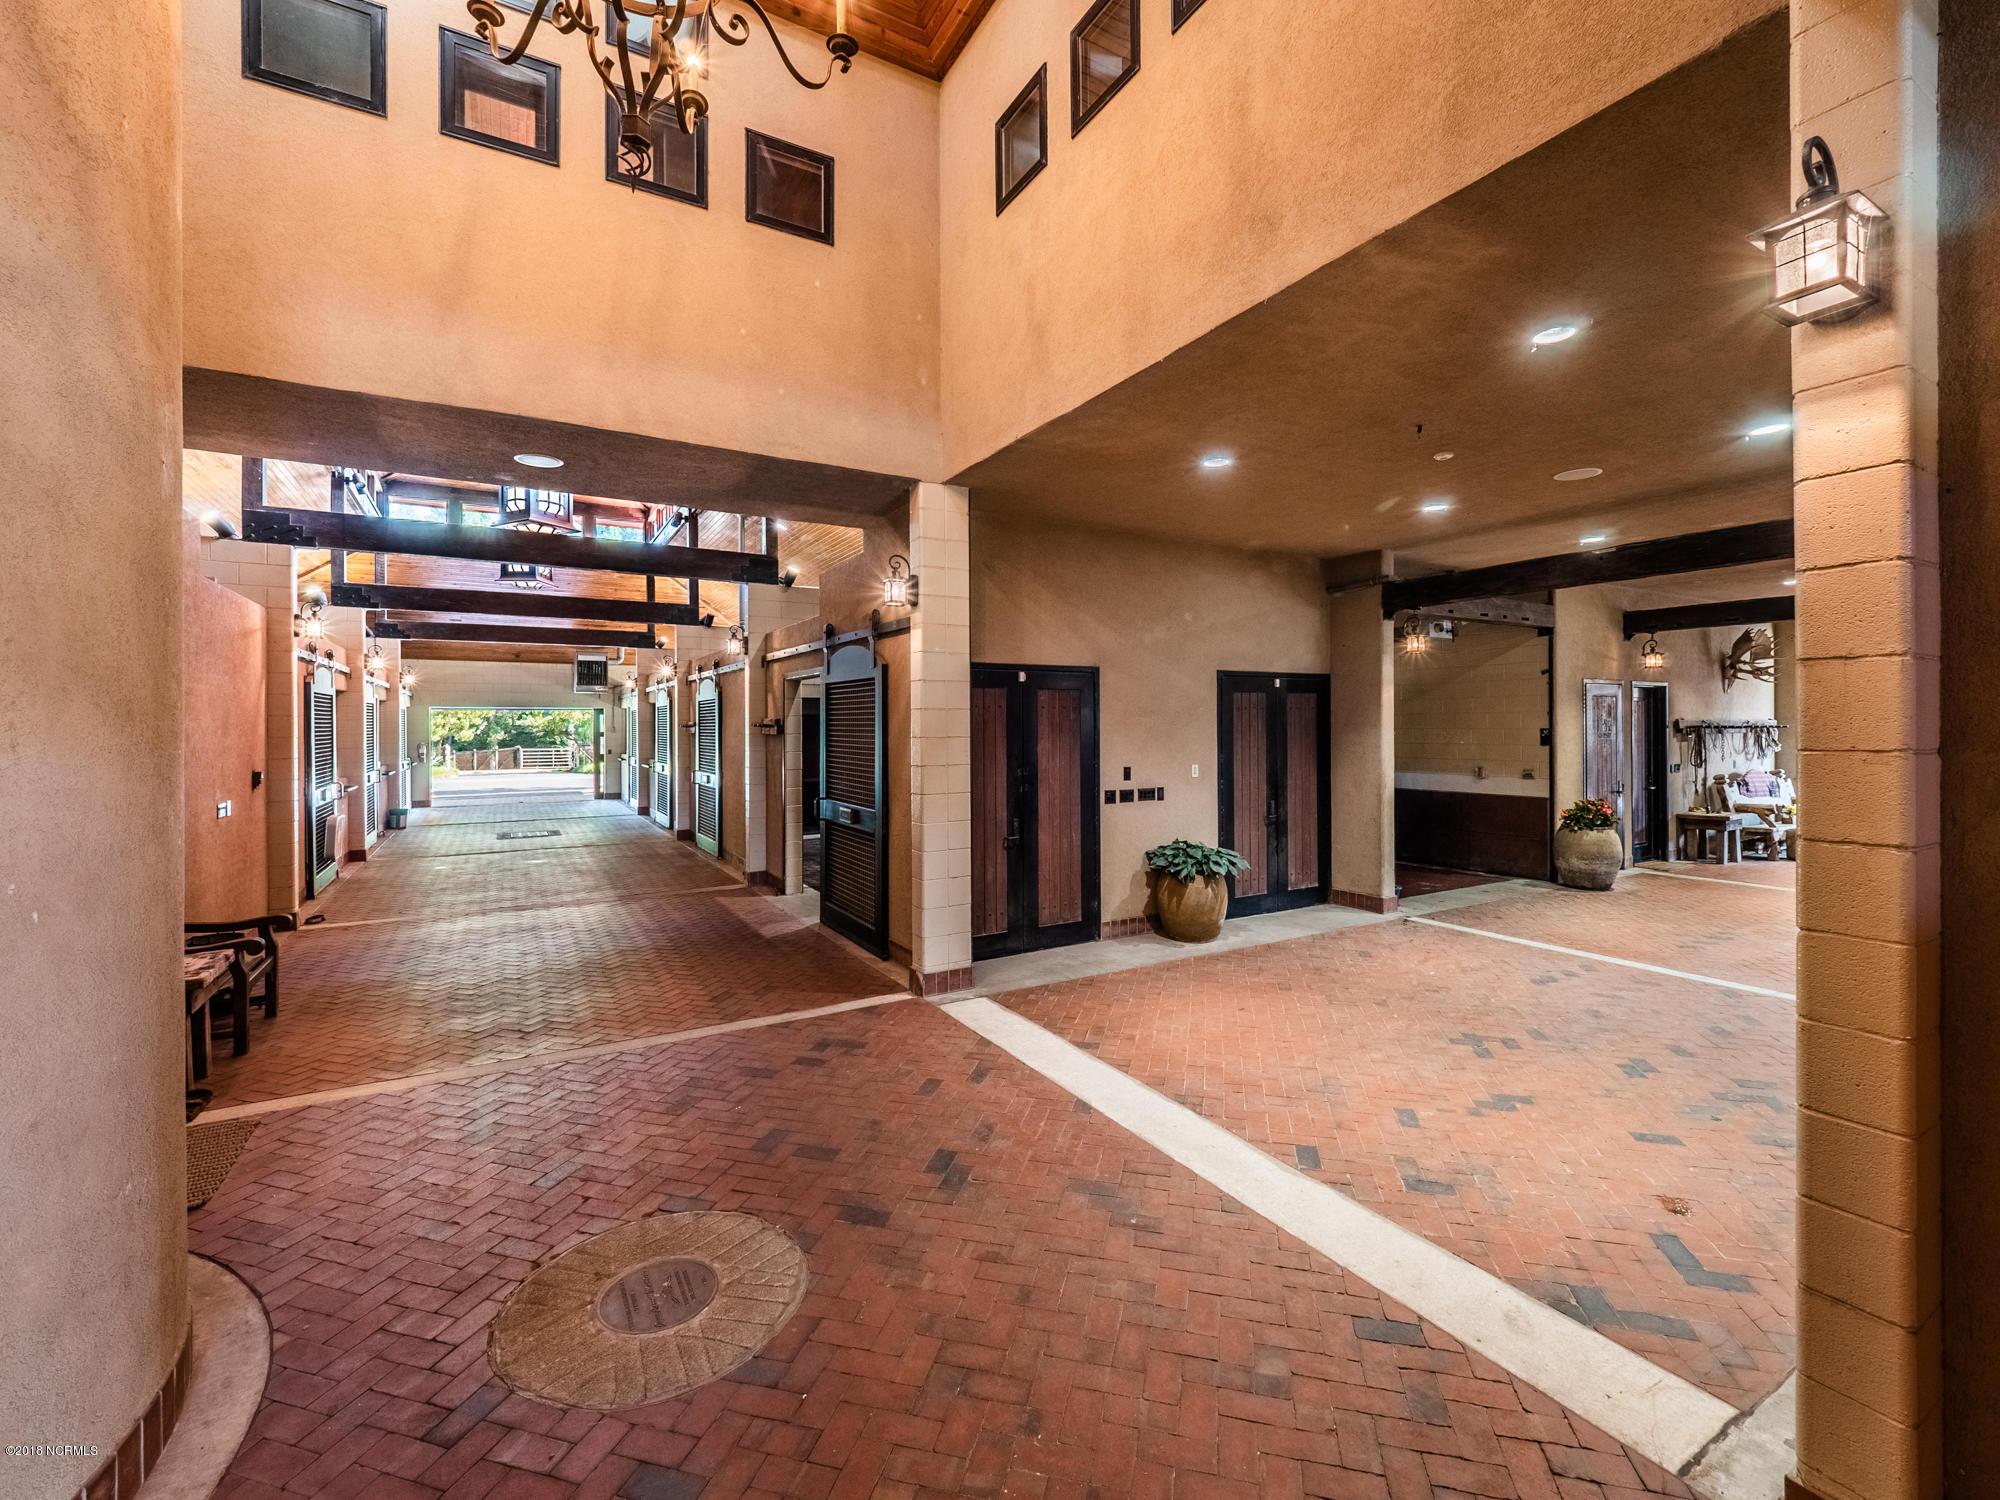 525 Longhorn Creek Lane, Turkey, North Carolina 28393, 1 Bedroom Bedrooms, 7 Rooms Rooms,1 BathroomBathrooms,Single family residence,For sale,Longhorn Creek,100126685